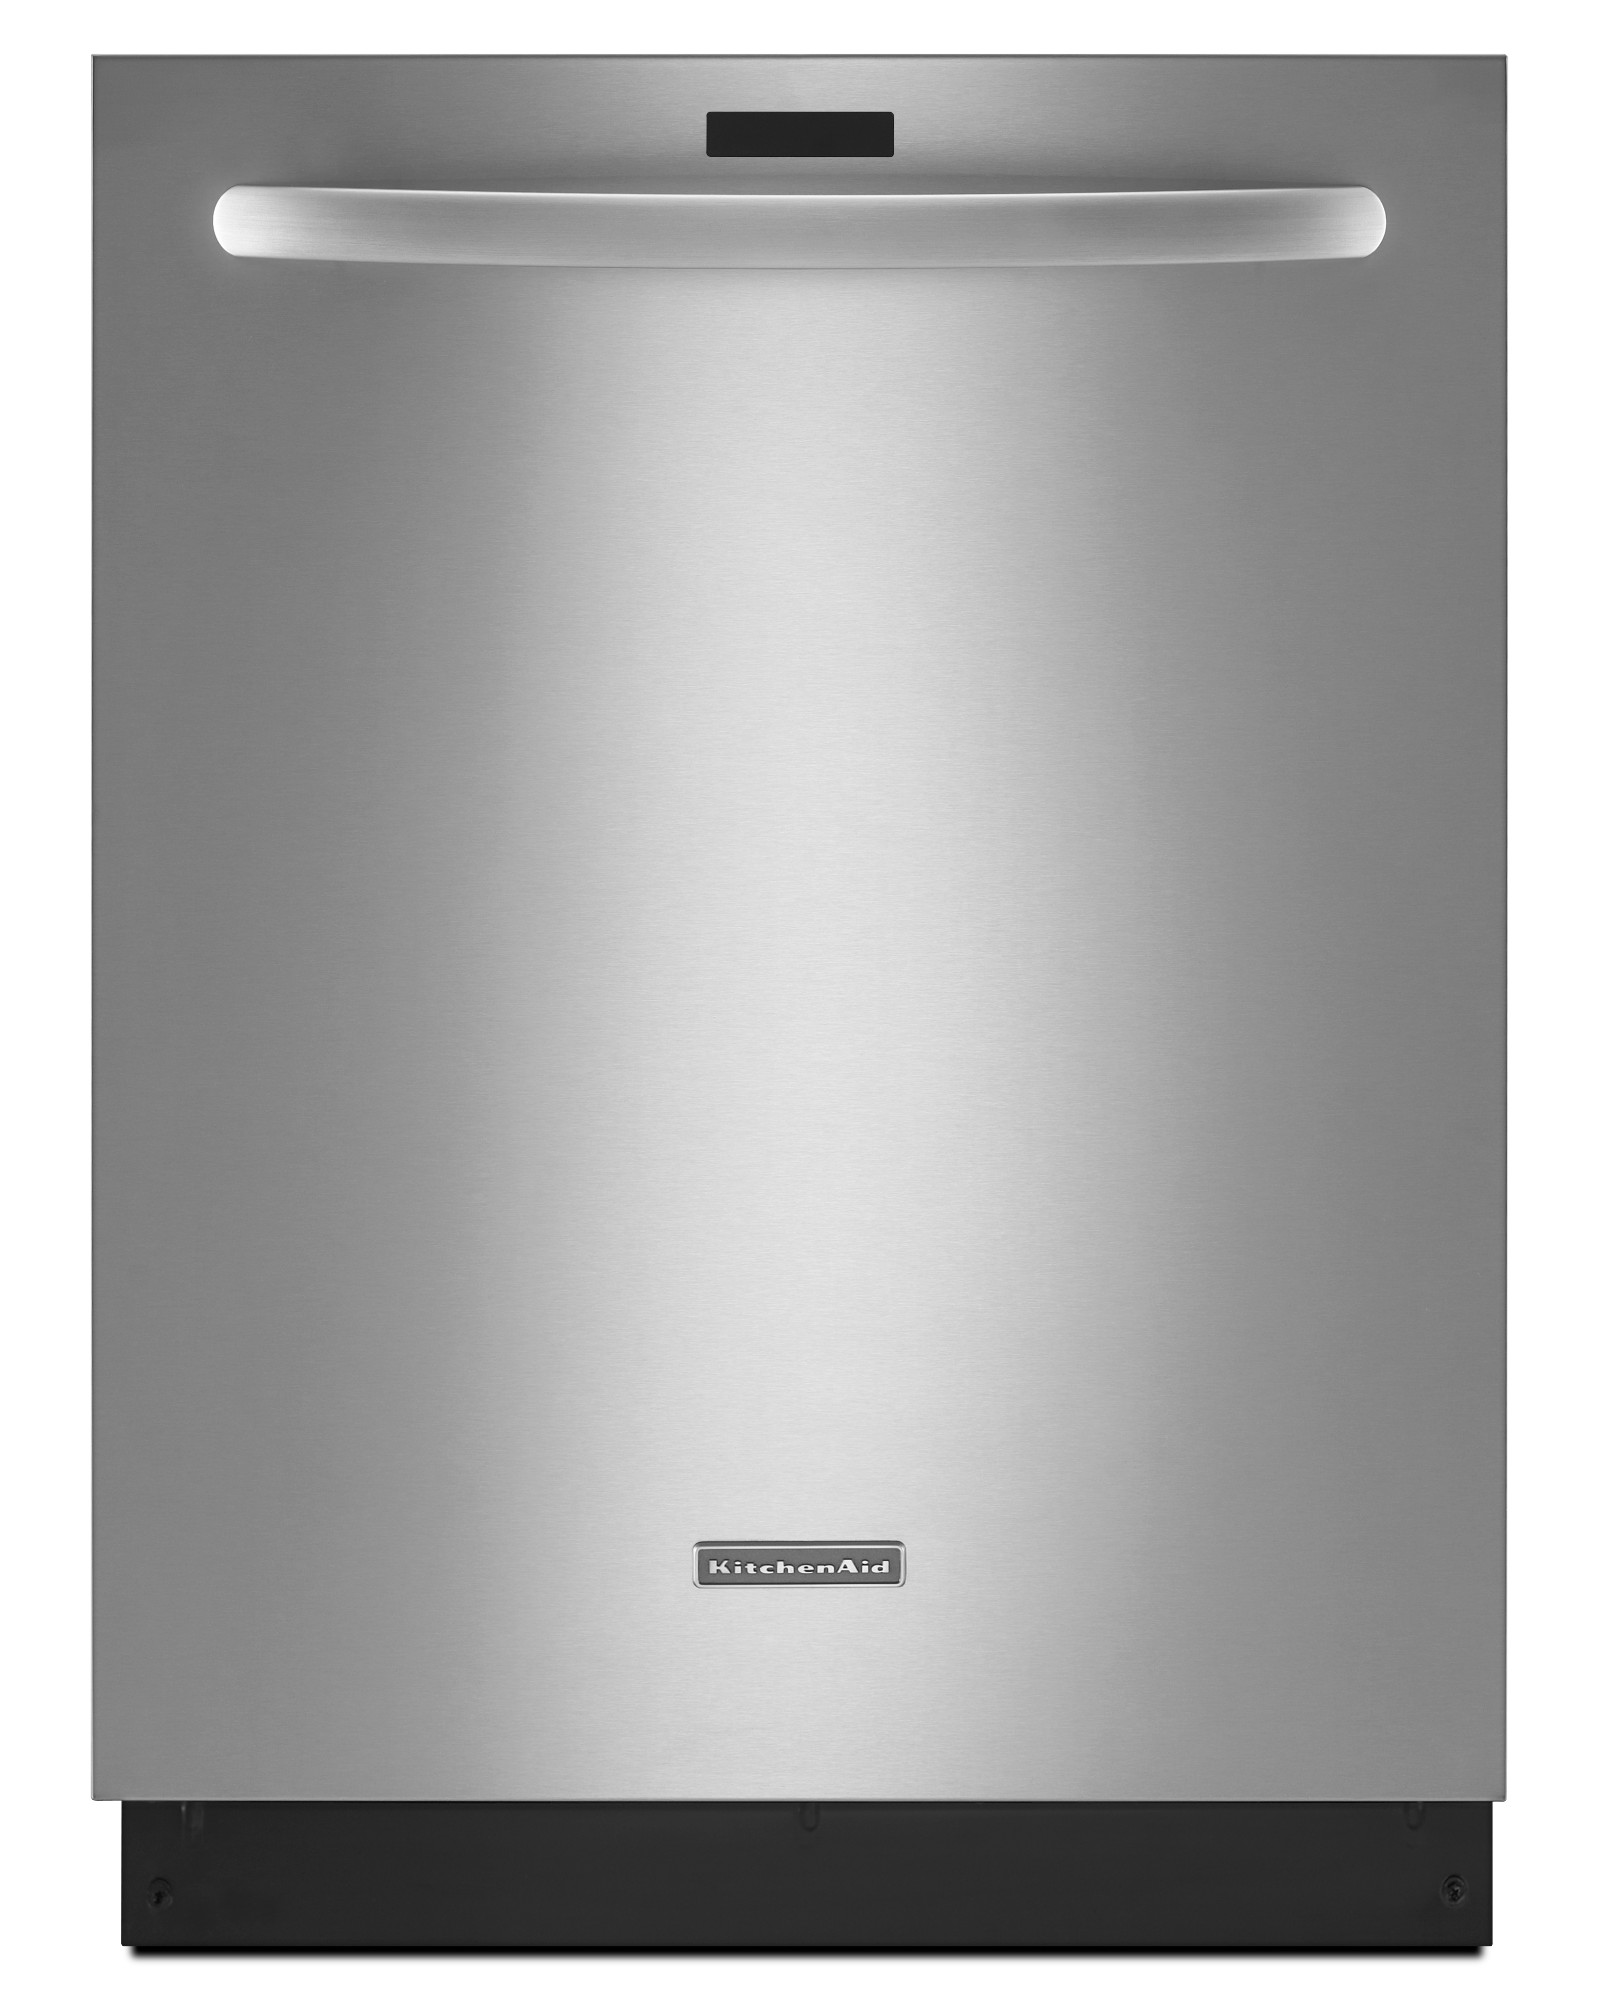 kitchen aid appliances sink drain size kitchenaid kdtm354dss 24 quot built in 6 cycle dishwasher w